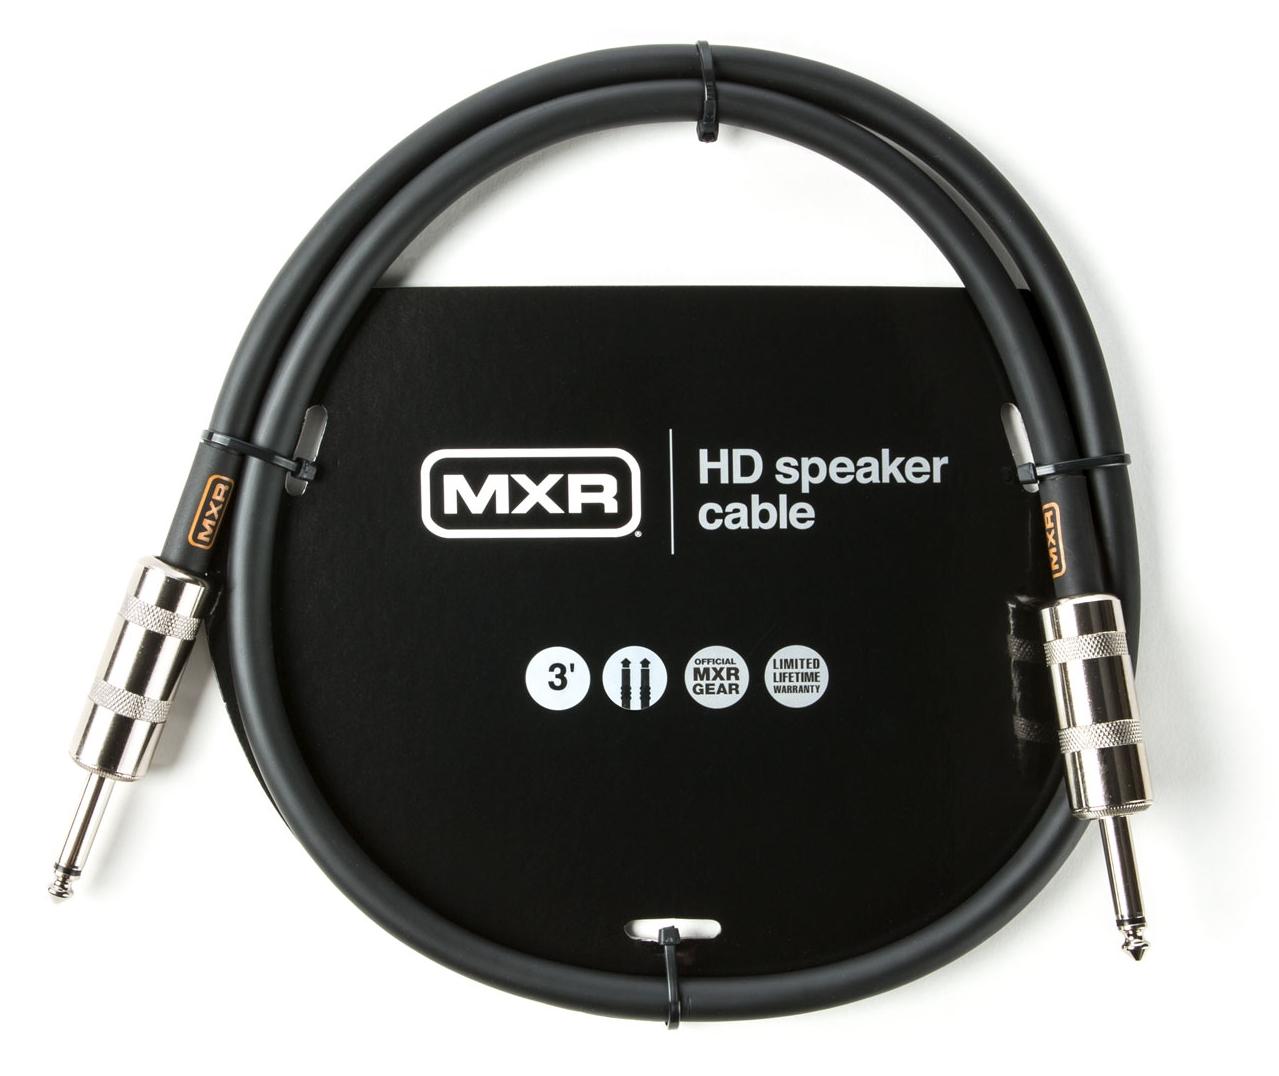 DUNLOP MXR Speaker Cable TS HD 3FT